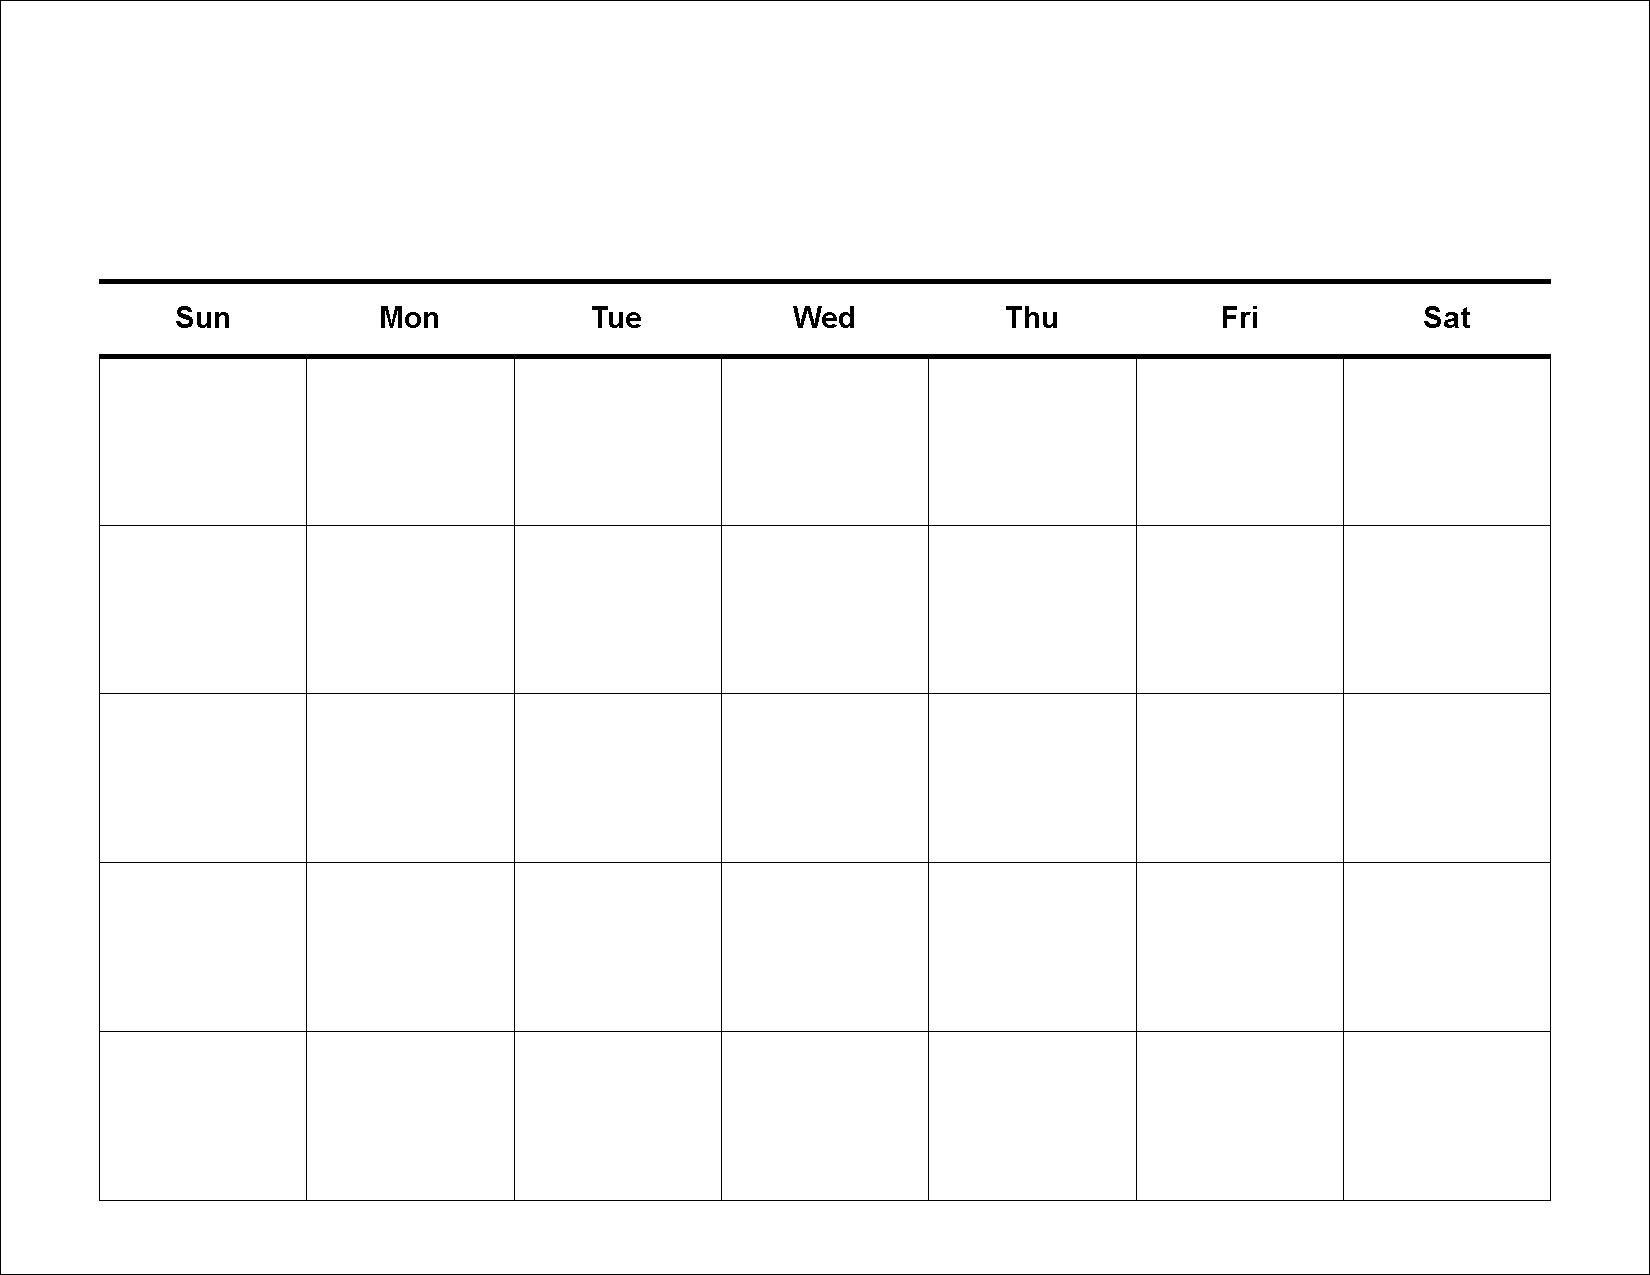 Blank 5 Day Week Calendar | Template Calendar Printable pertaining to 5 Day Blank Calendar Template